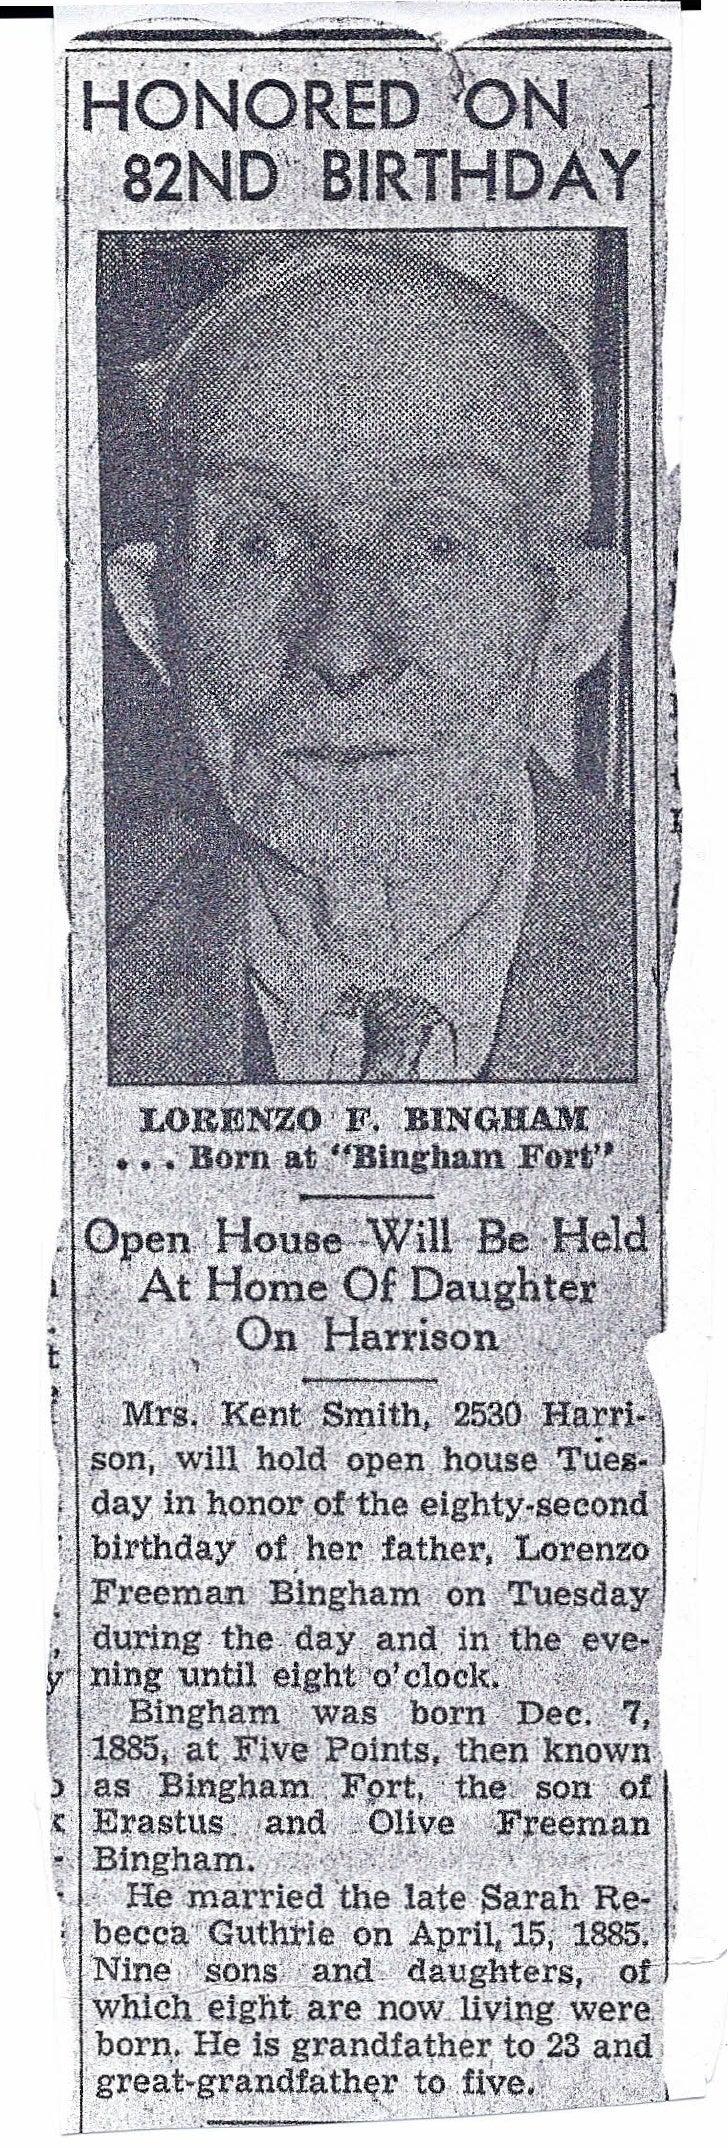 Lorenzo Freeman Bingham Birthday Announcement